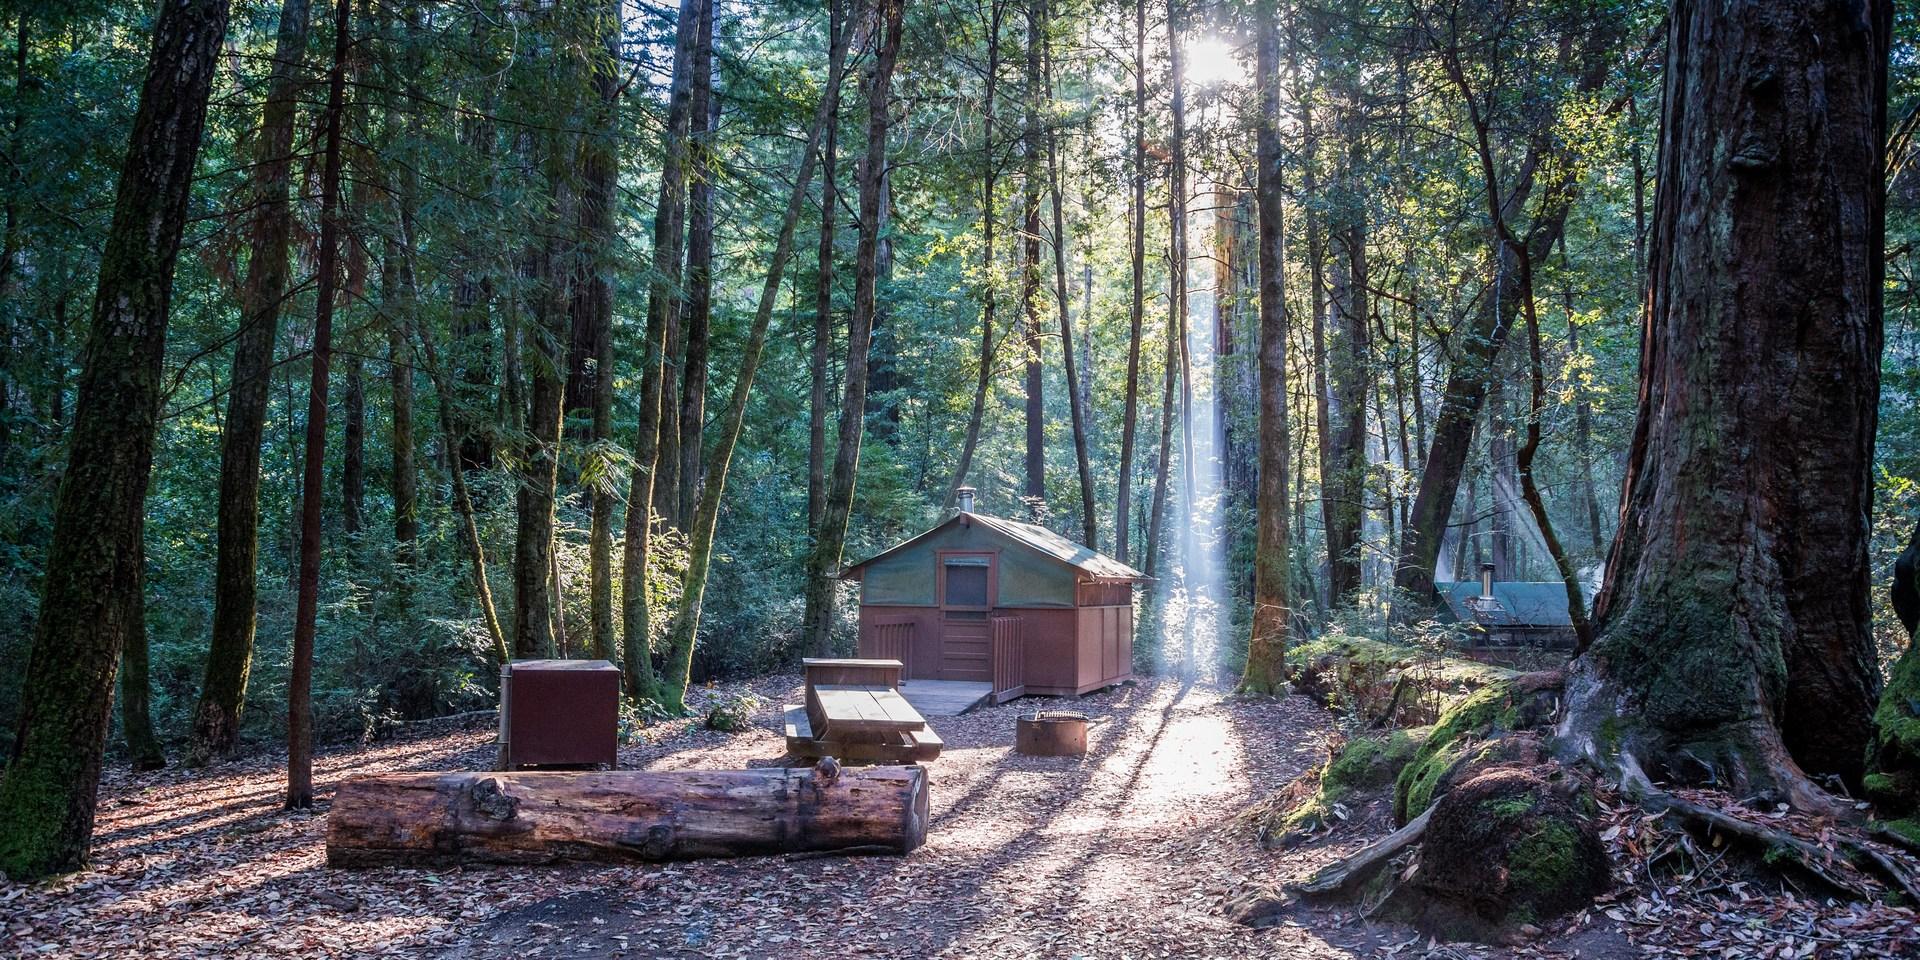 Huckleberry C&ground. Big Basin ... & Huckleberry Campground | Outdoor Project